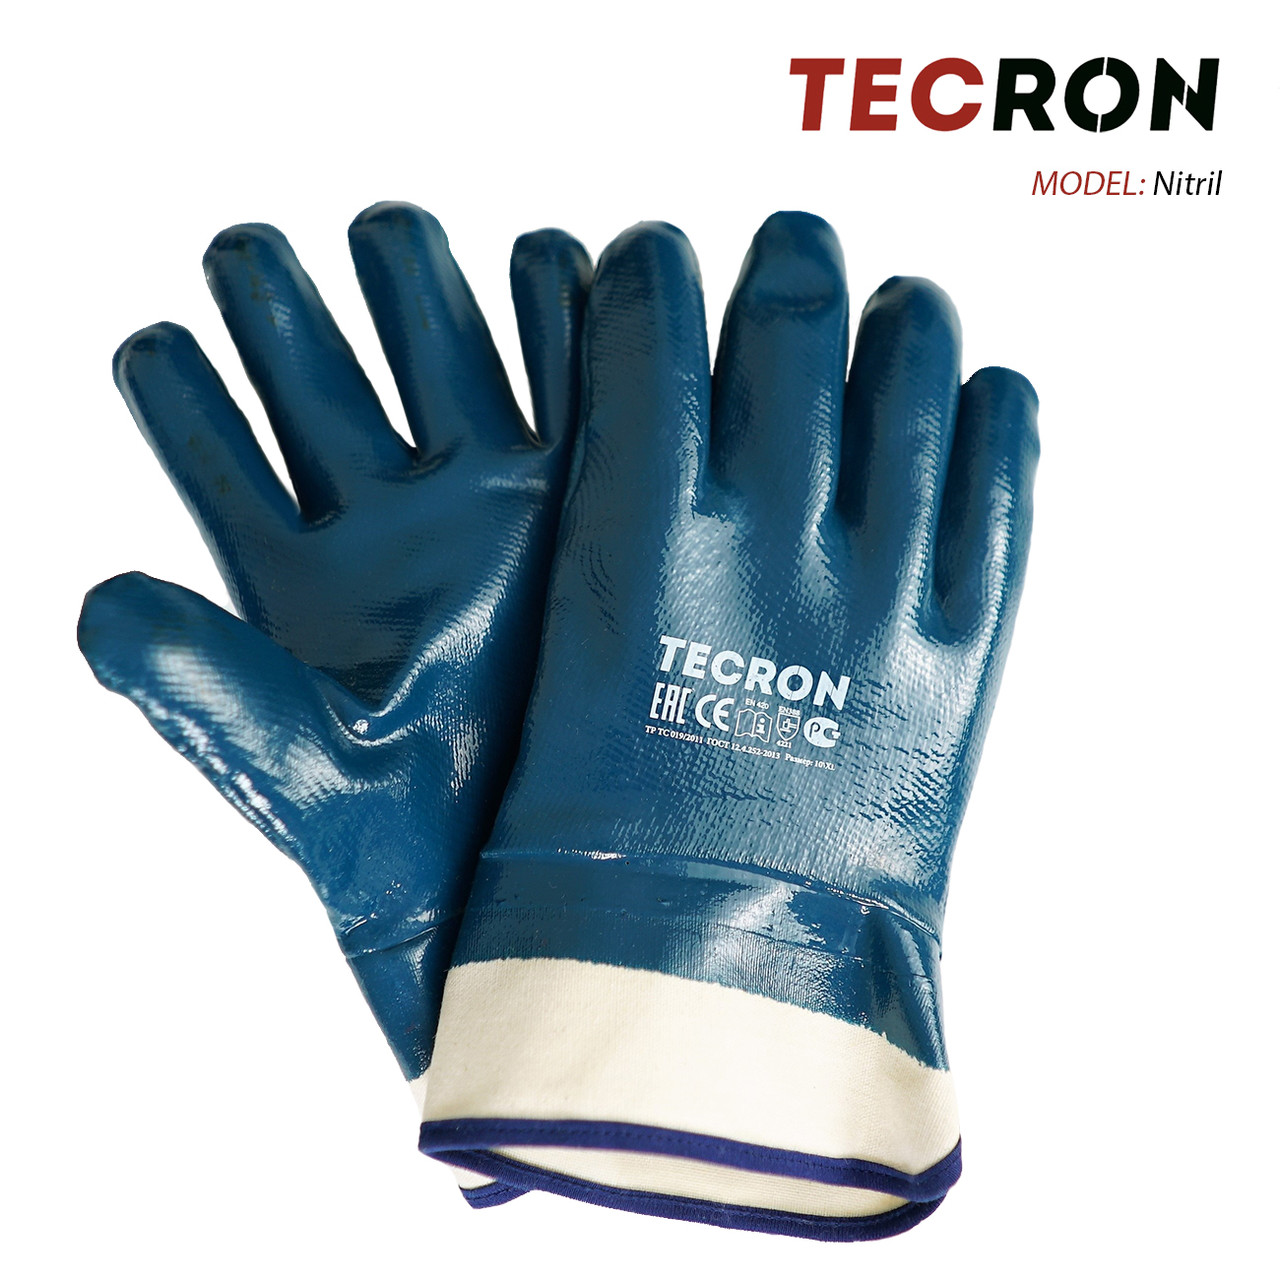 Нитриловые перчатки-краги TECRON Nitril